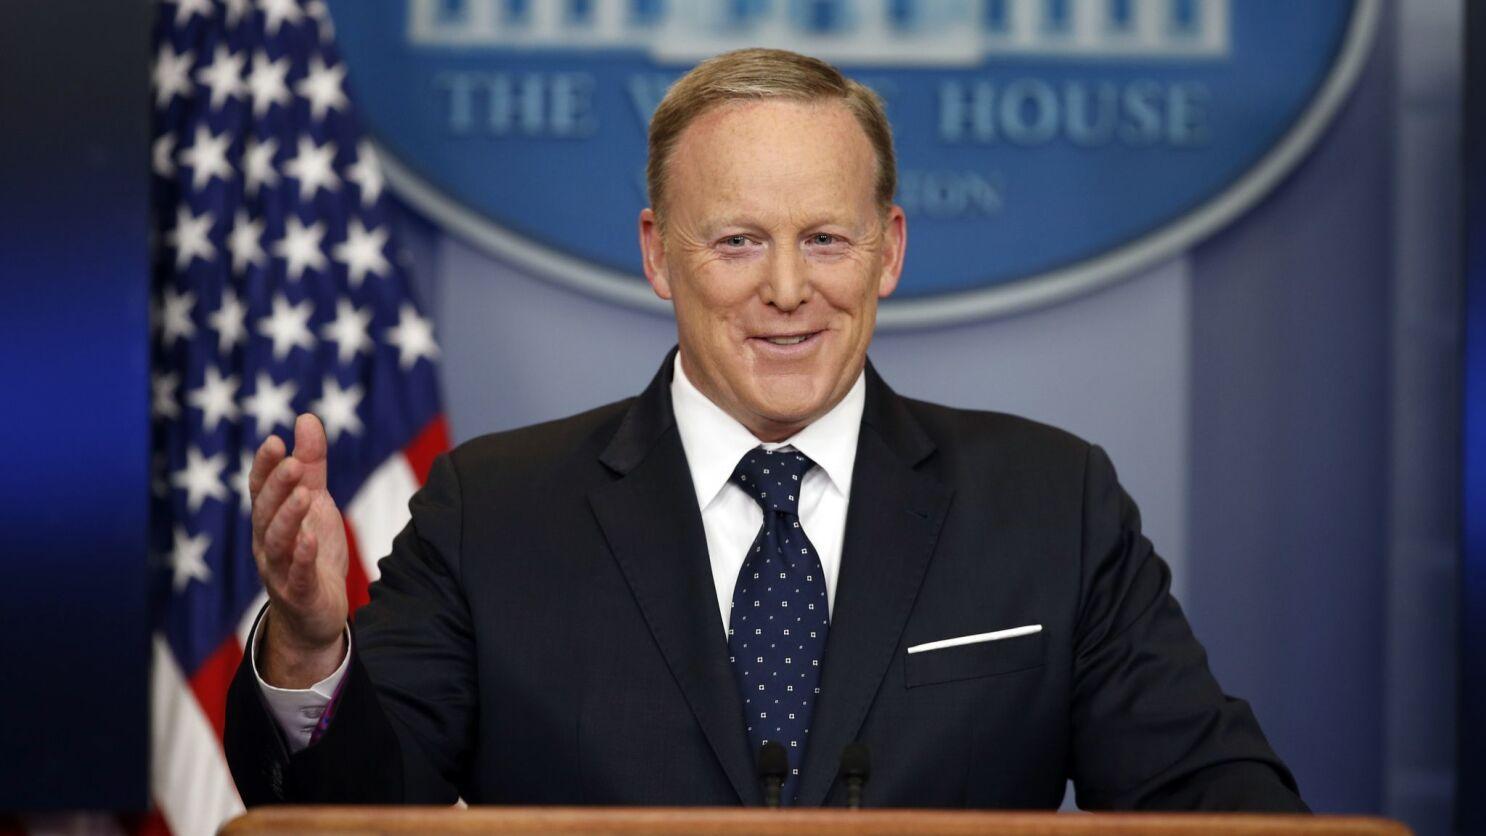 Sean Spicer dismisses 'Dancing With the Stars' backlash